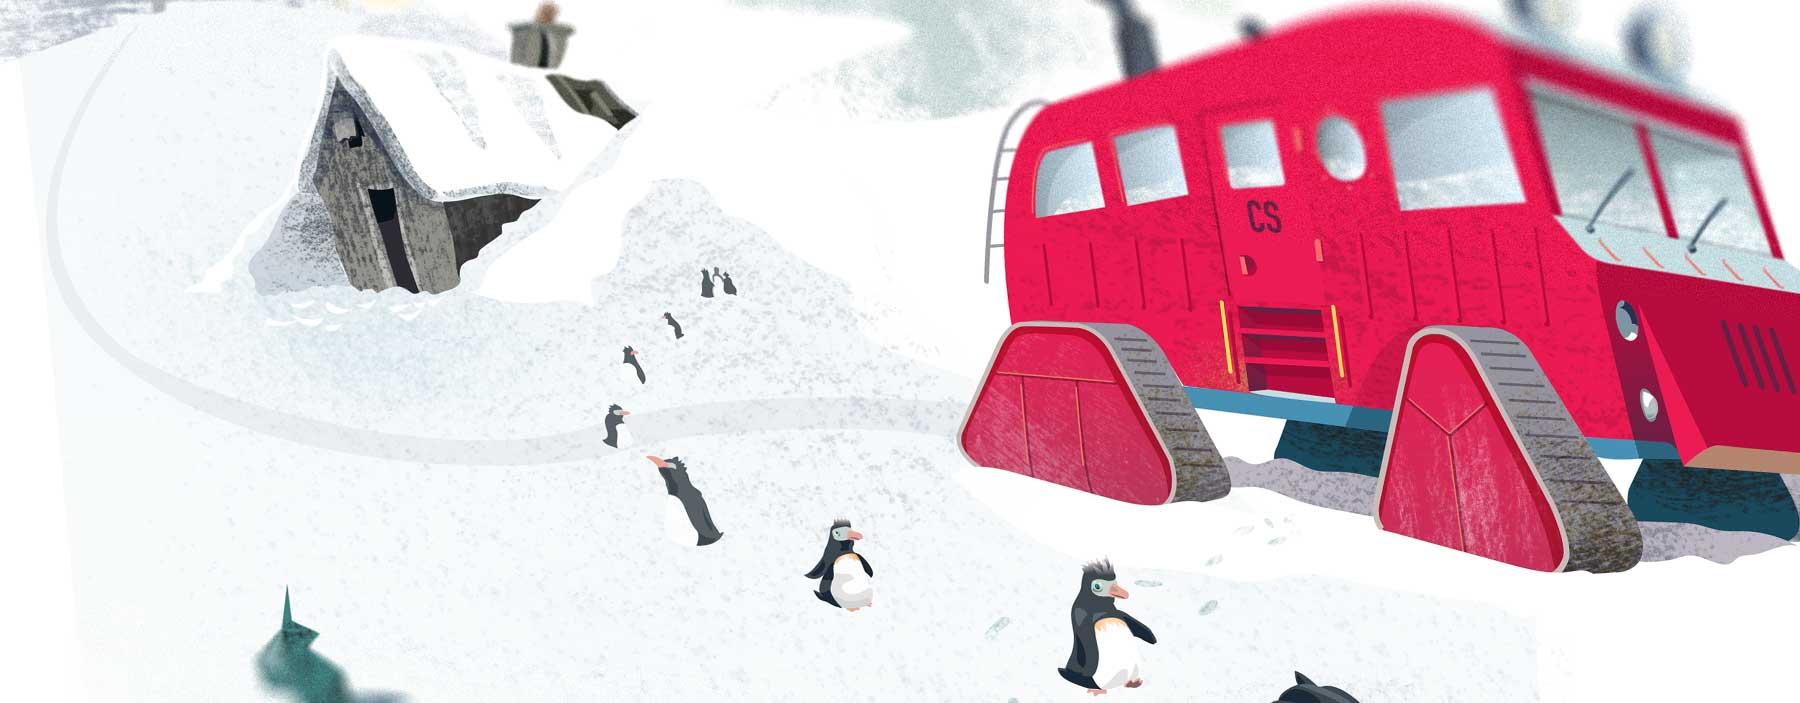 Kids Storytelling Poster of Antarctic Exploration